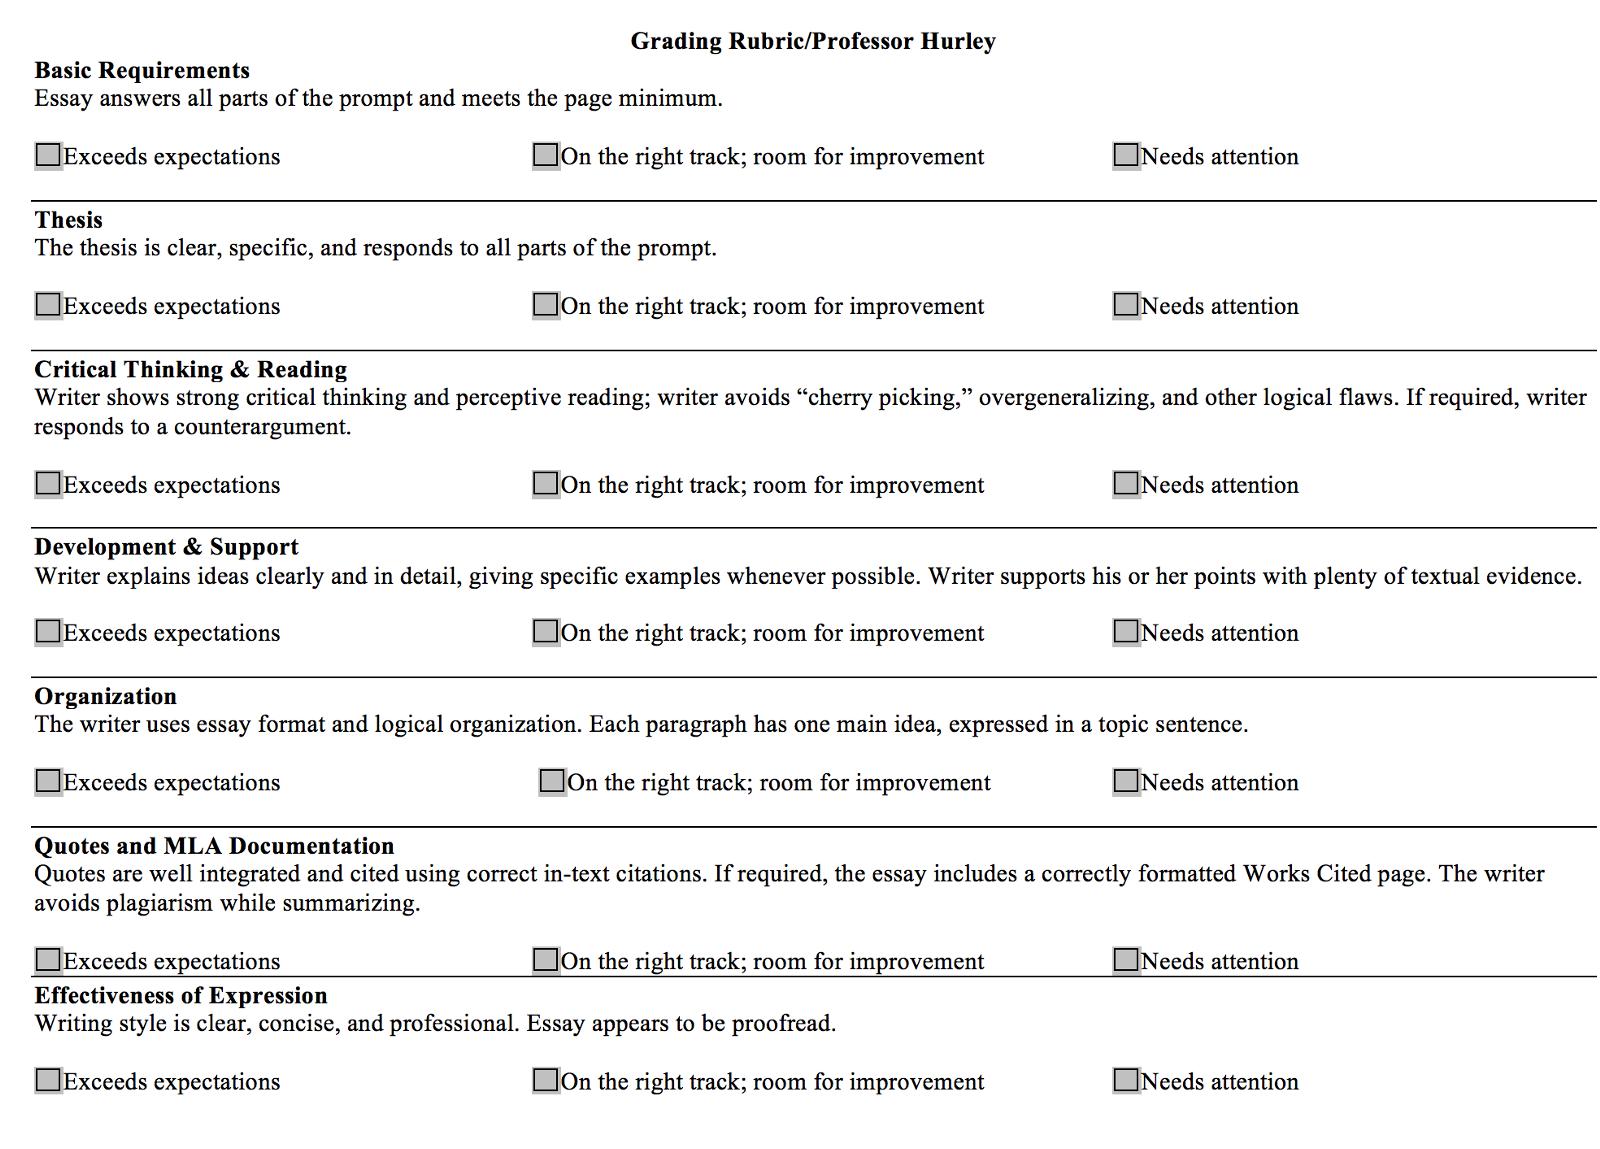 001 Essay Example Rubric College 1l7bkjqmu2kth Pcoqy7bgg Wonderful Board Narrative Writing Persuasive Full